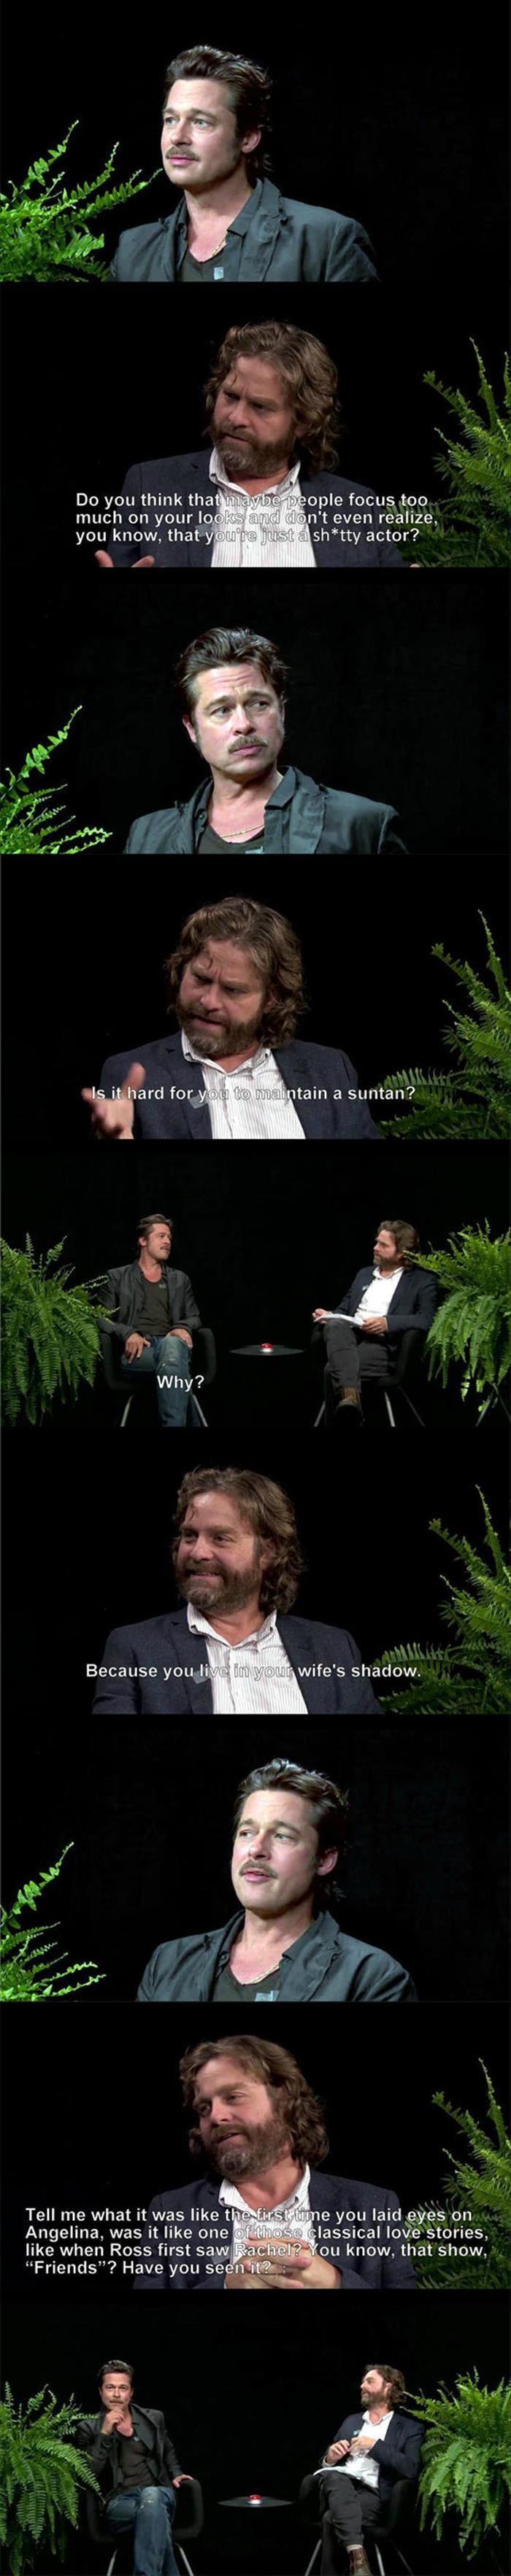 Brad Pitt On Between Two Ferns with Zach Galifianakis  20 Pics